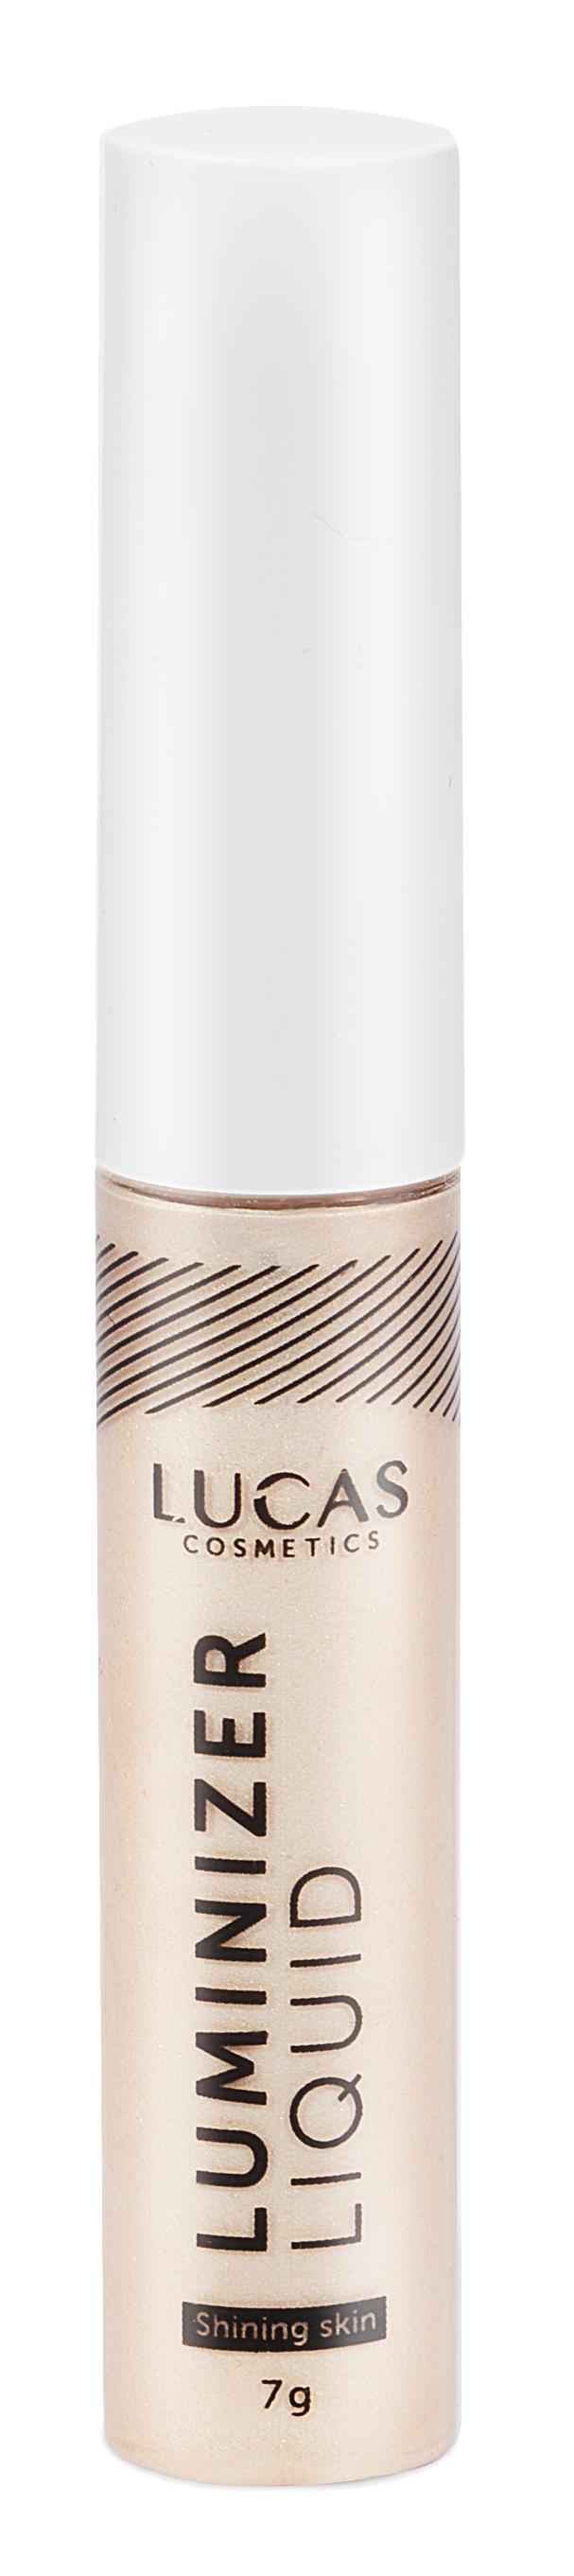 LUCAS' COSMETICS Хайлайтер жидкий № 104 / Luminizer Liquid Summer Glow 7 г